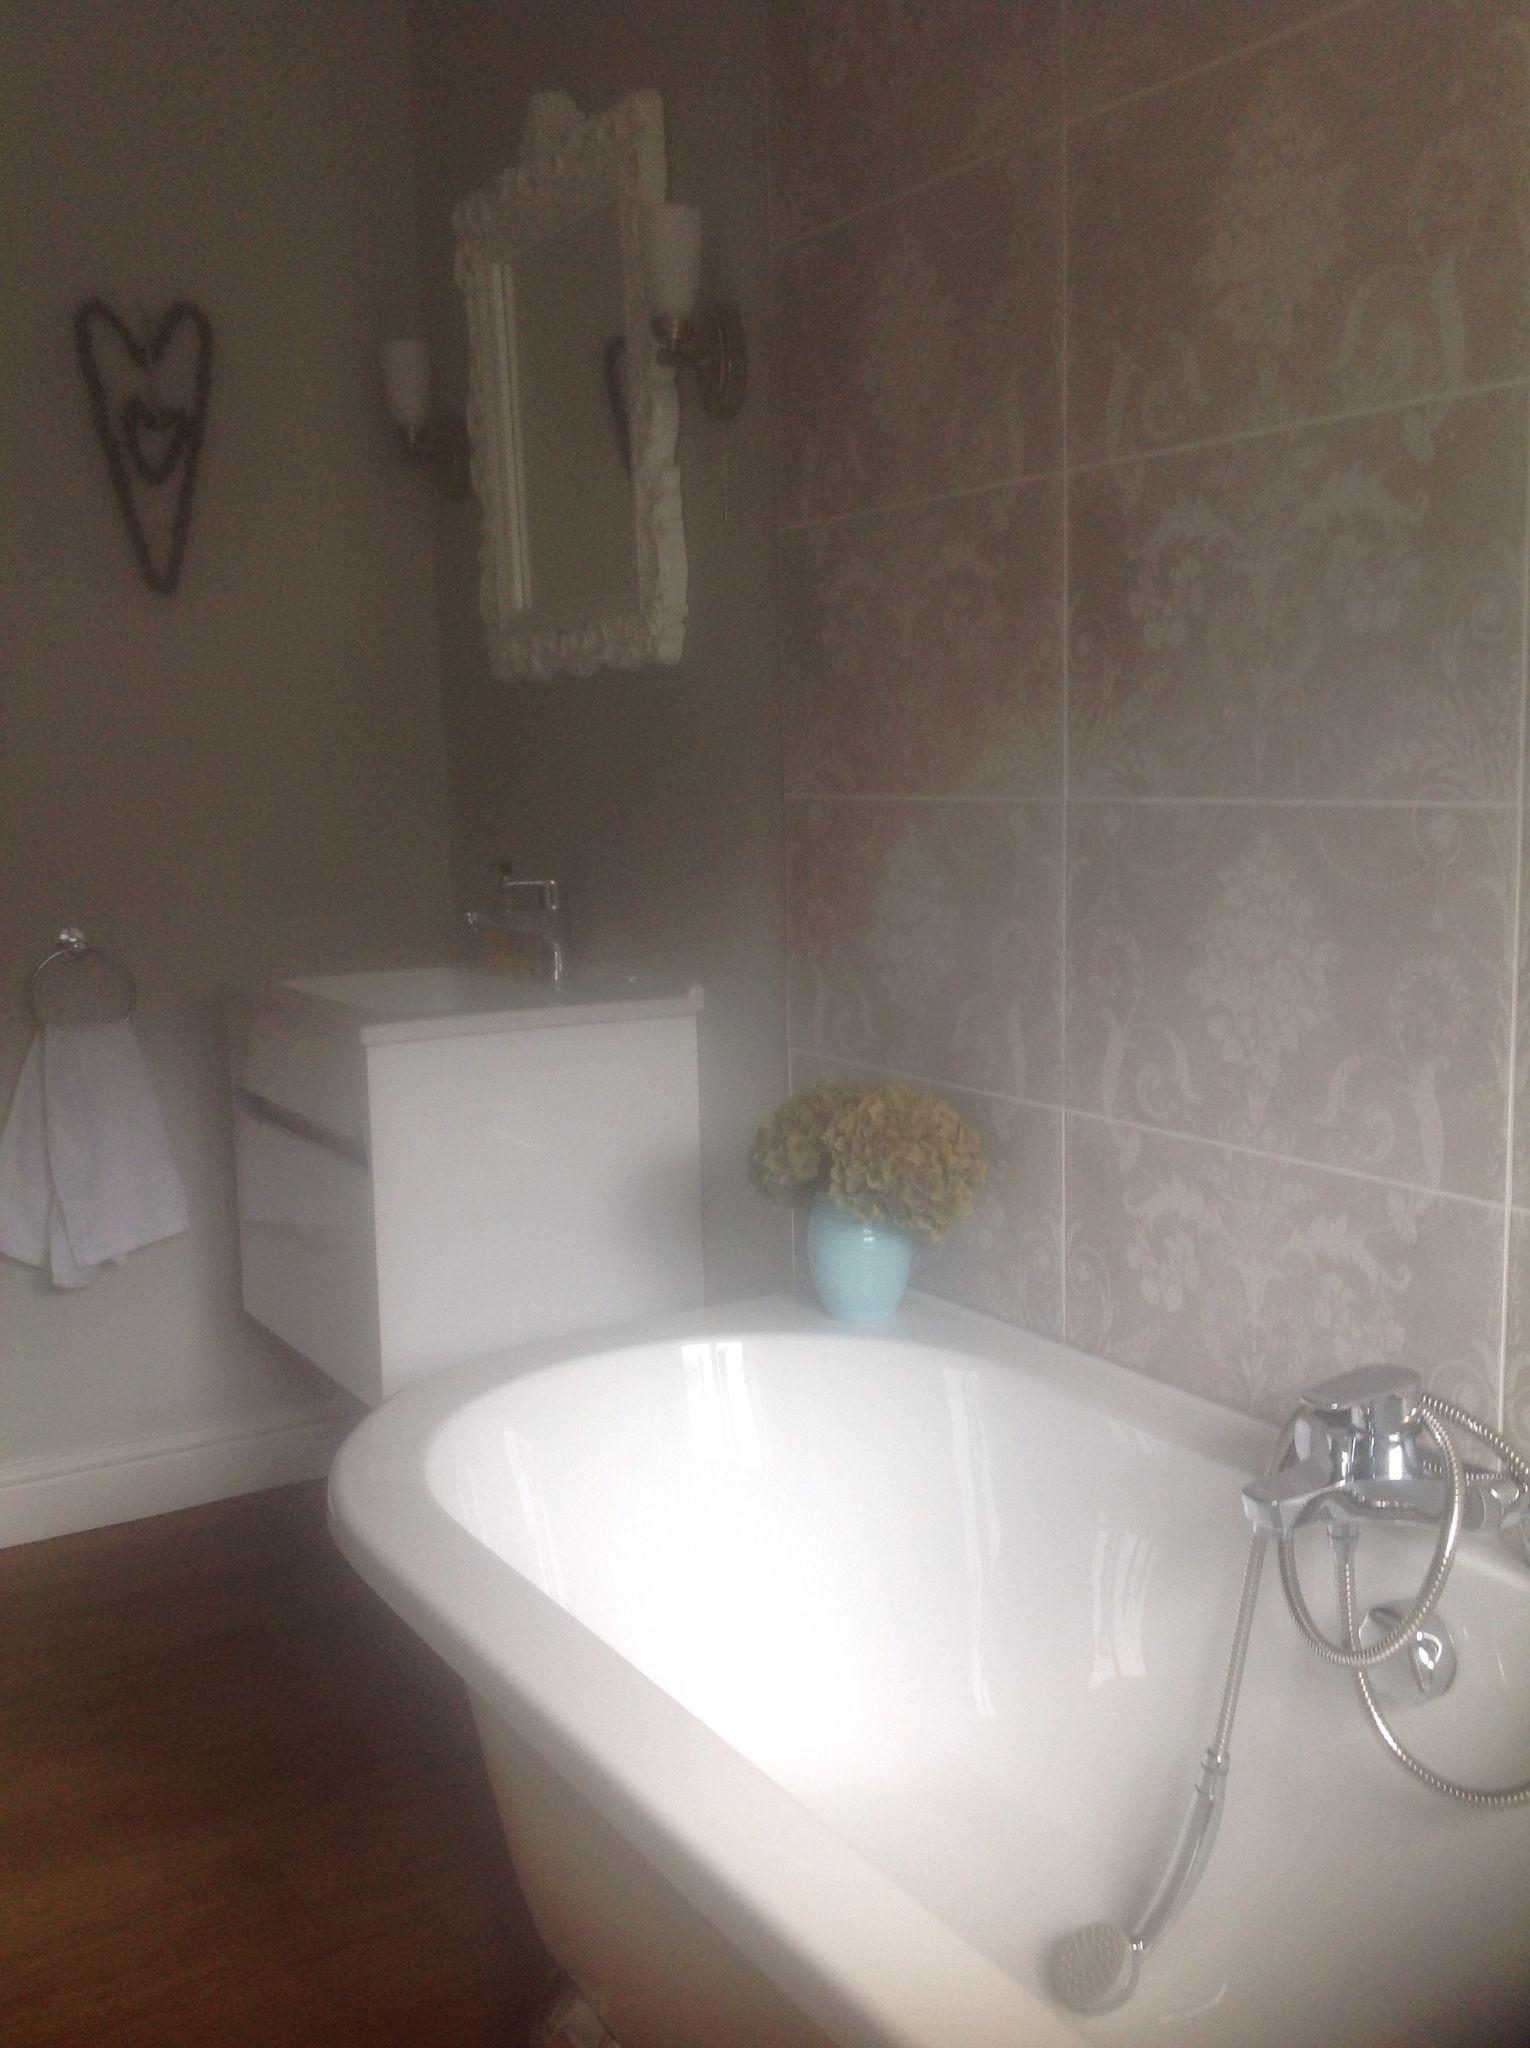 Laura Ashley Tiles Josette French Bathroom Tile Bathroom Bathroom